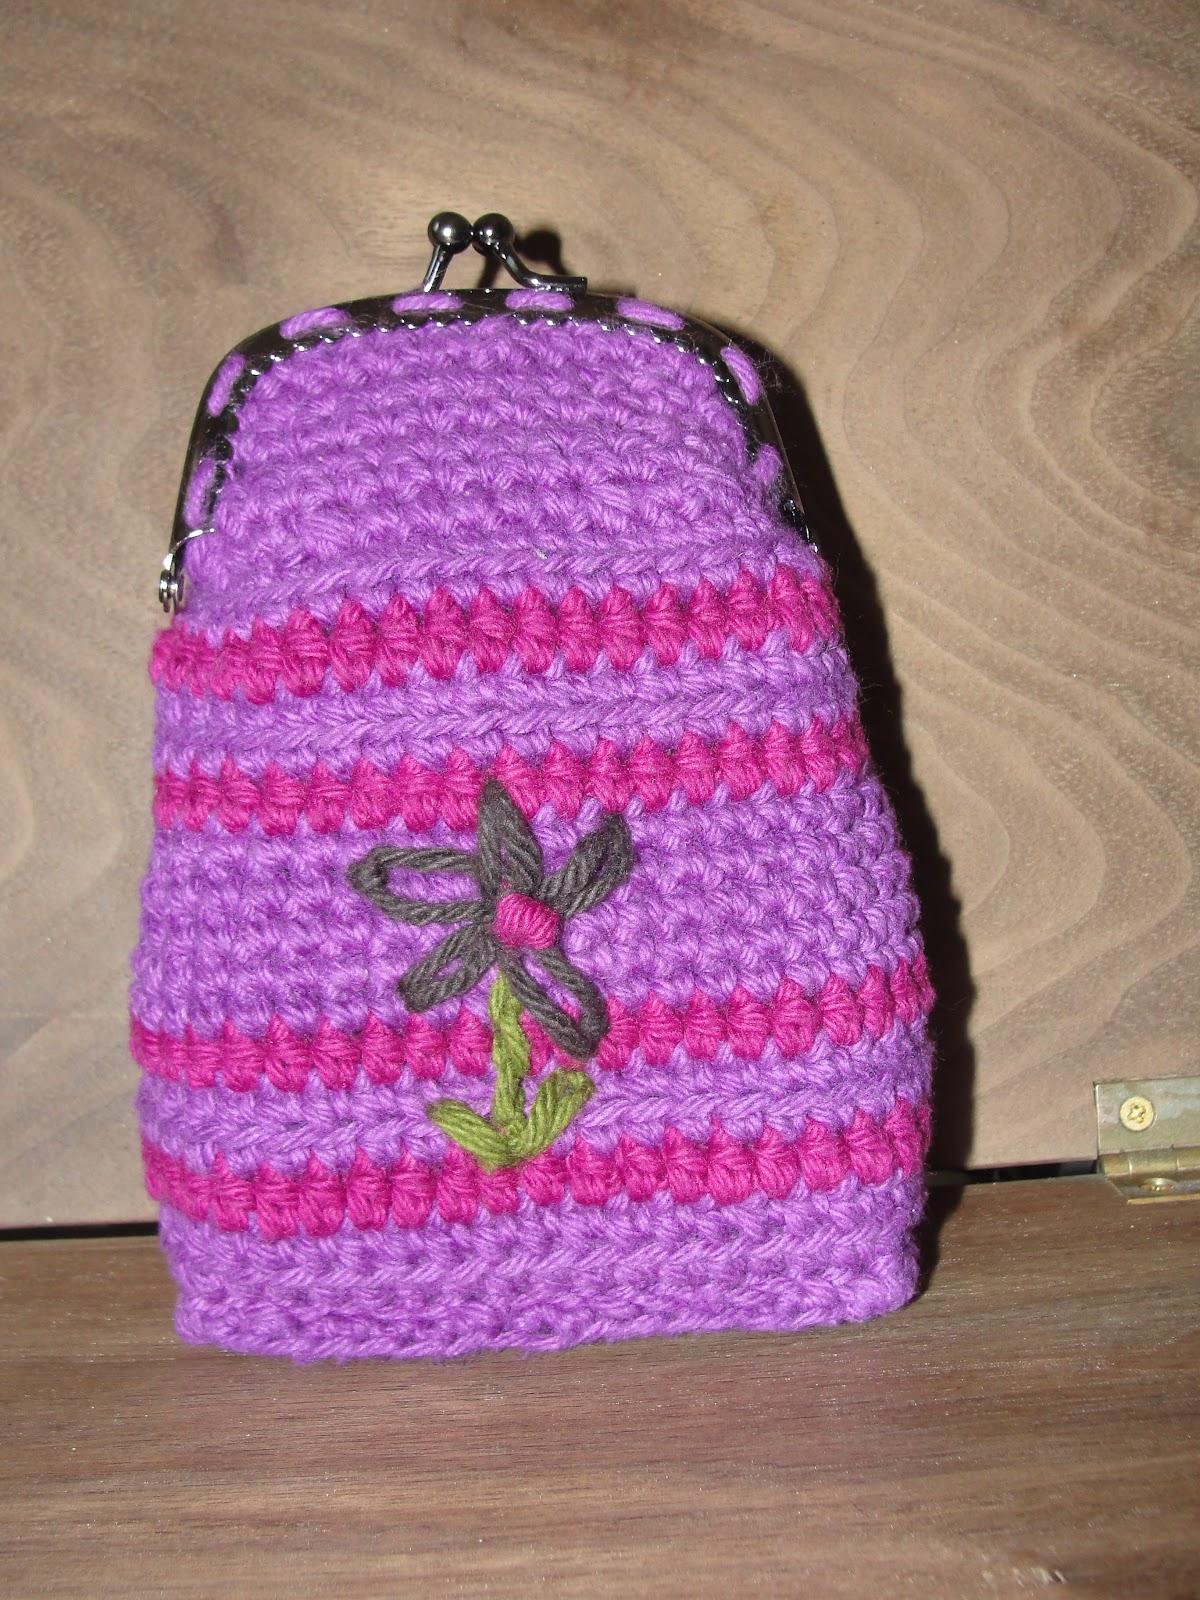 Free Crochet Pattern For Cigarette Case : libertycrochet: Carry-all cigarette case*